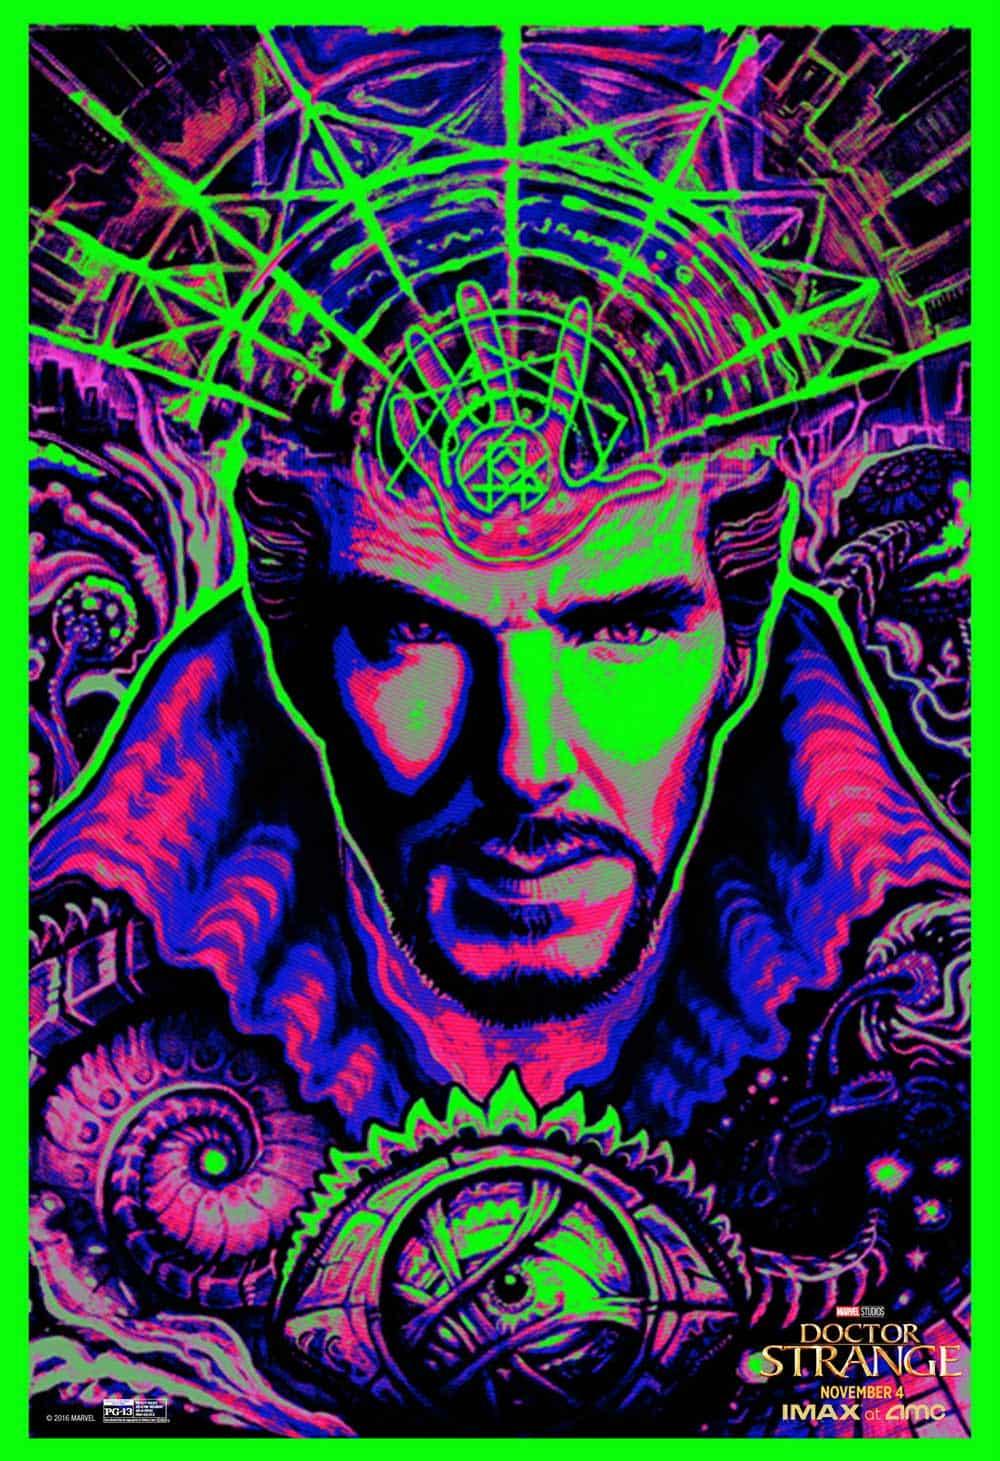 http://www.cinemascomics.com/wp-content/uploads/2016/10/doctor-strange-poster-psicodelico.jpg